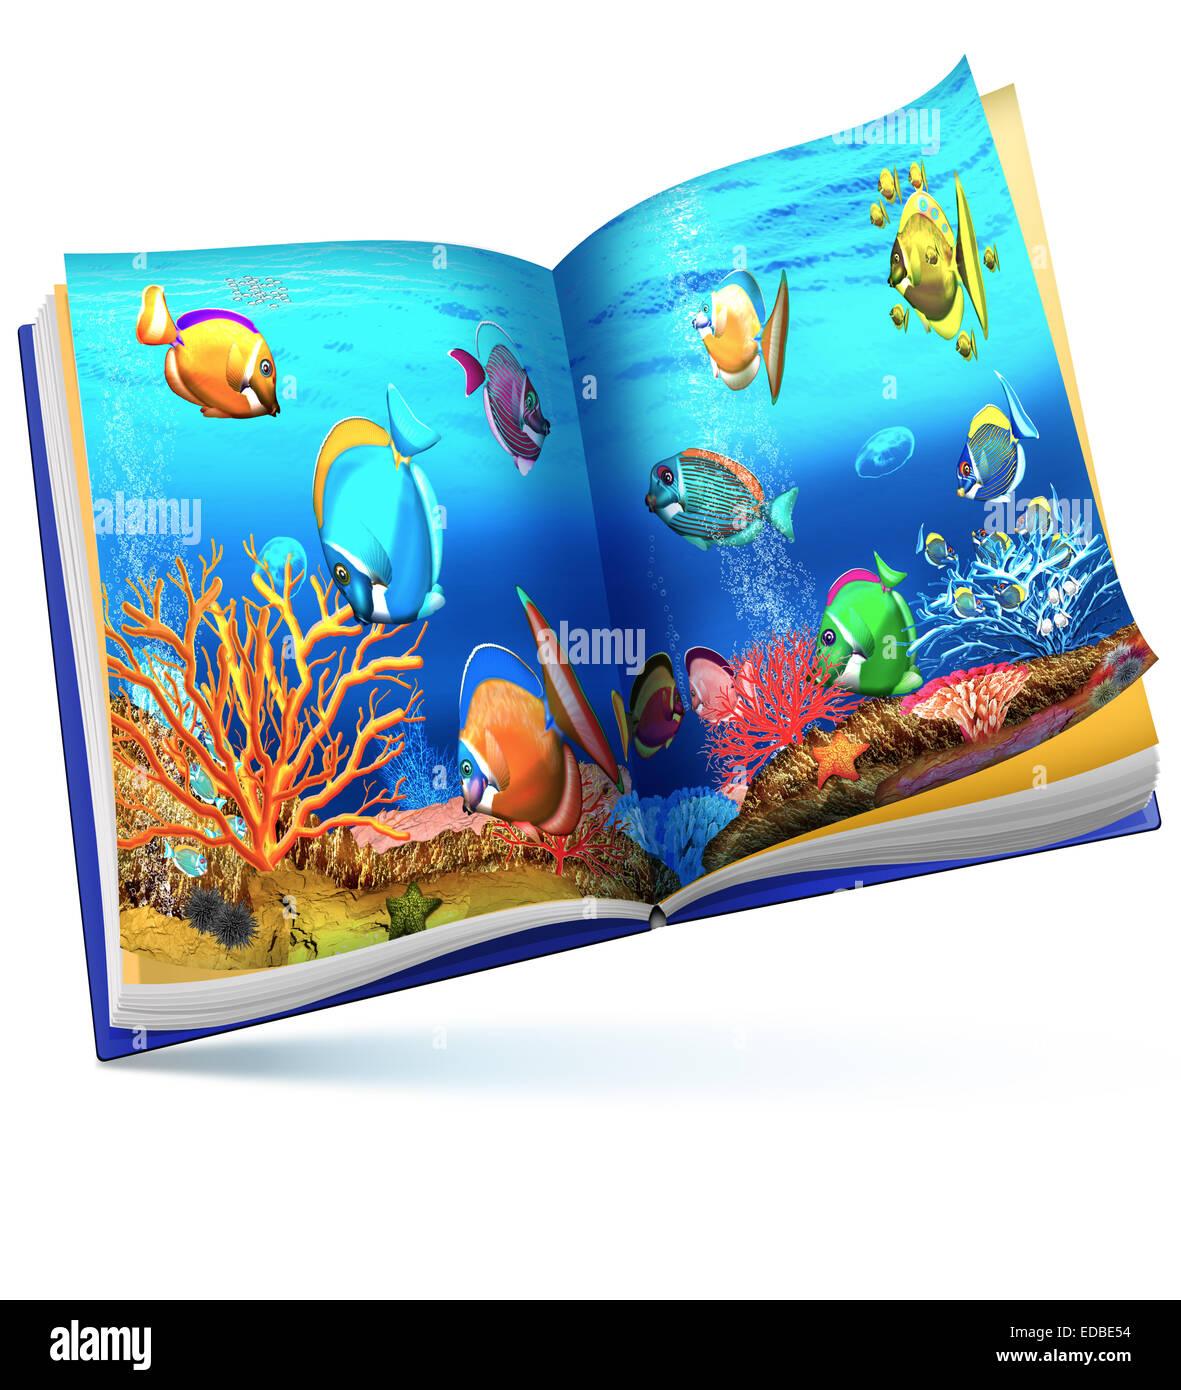 Coral reef, children's book illustration - Stock Image